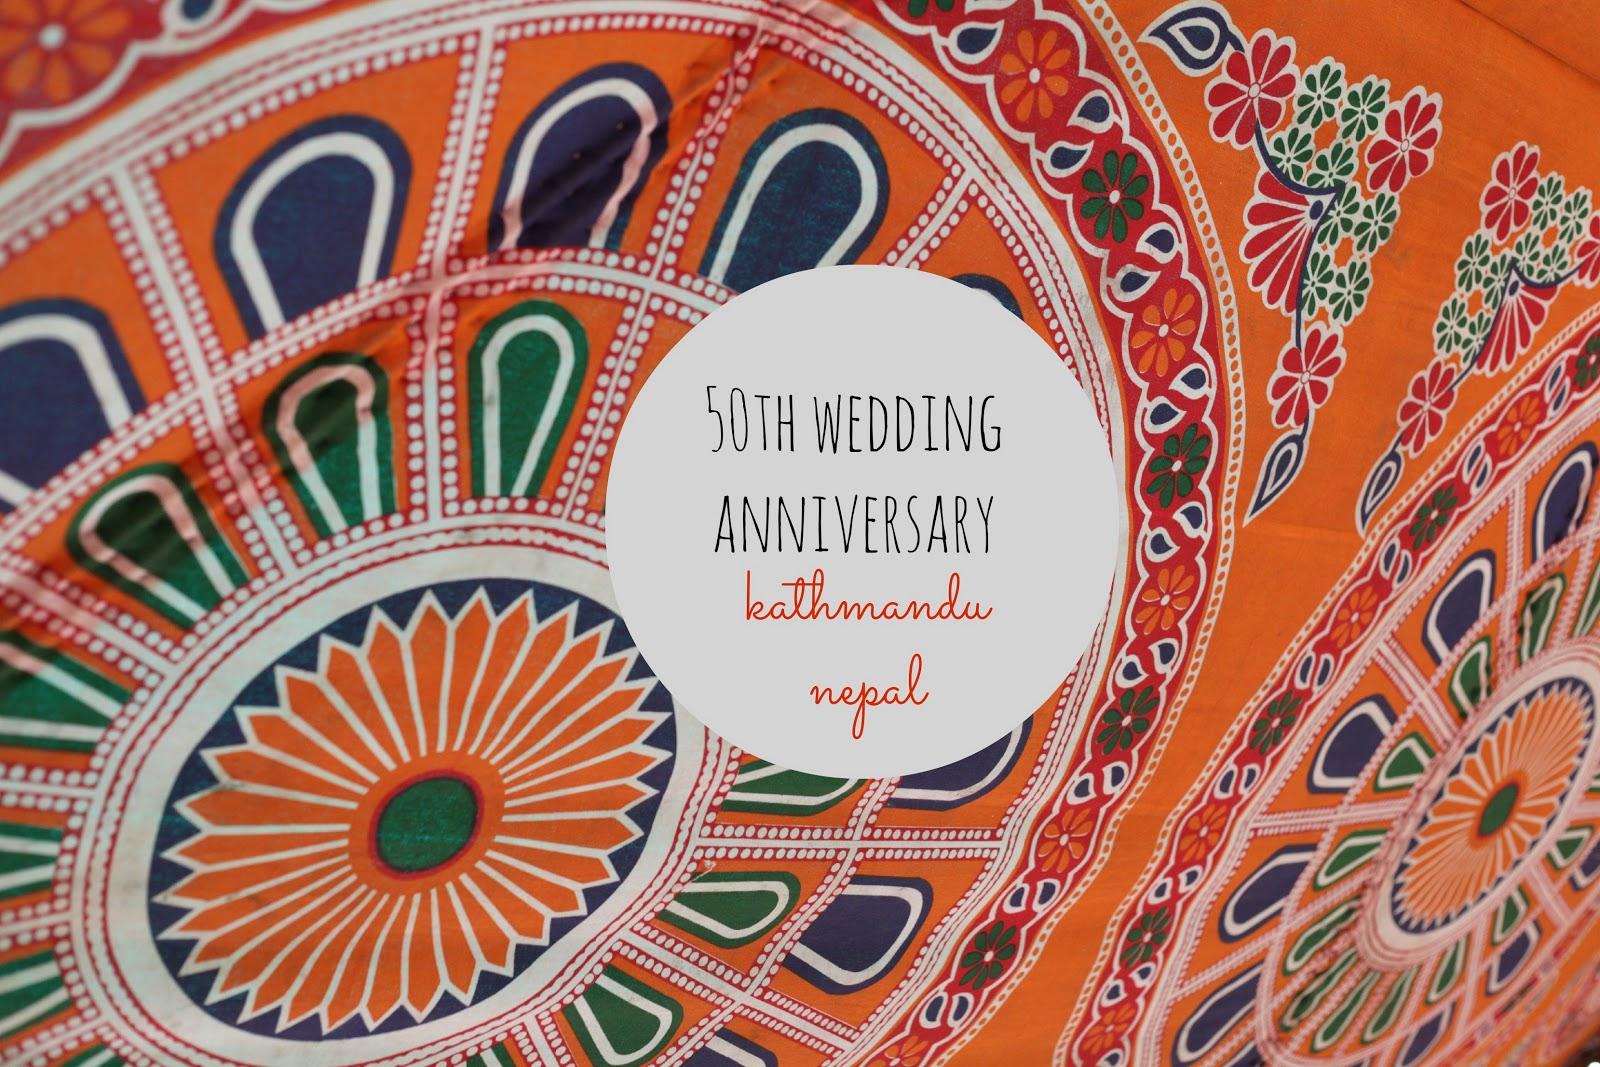 Hope engaged a th wedding anniversary nepali style